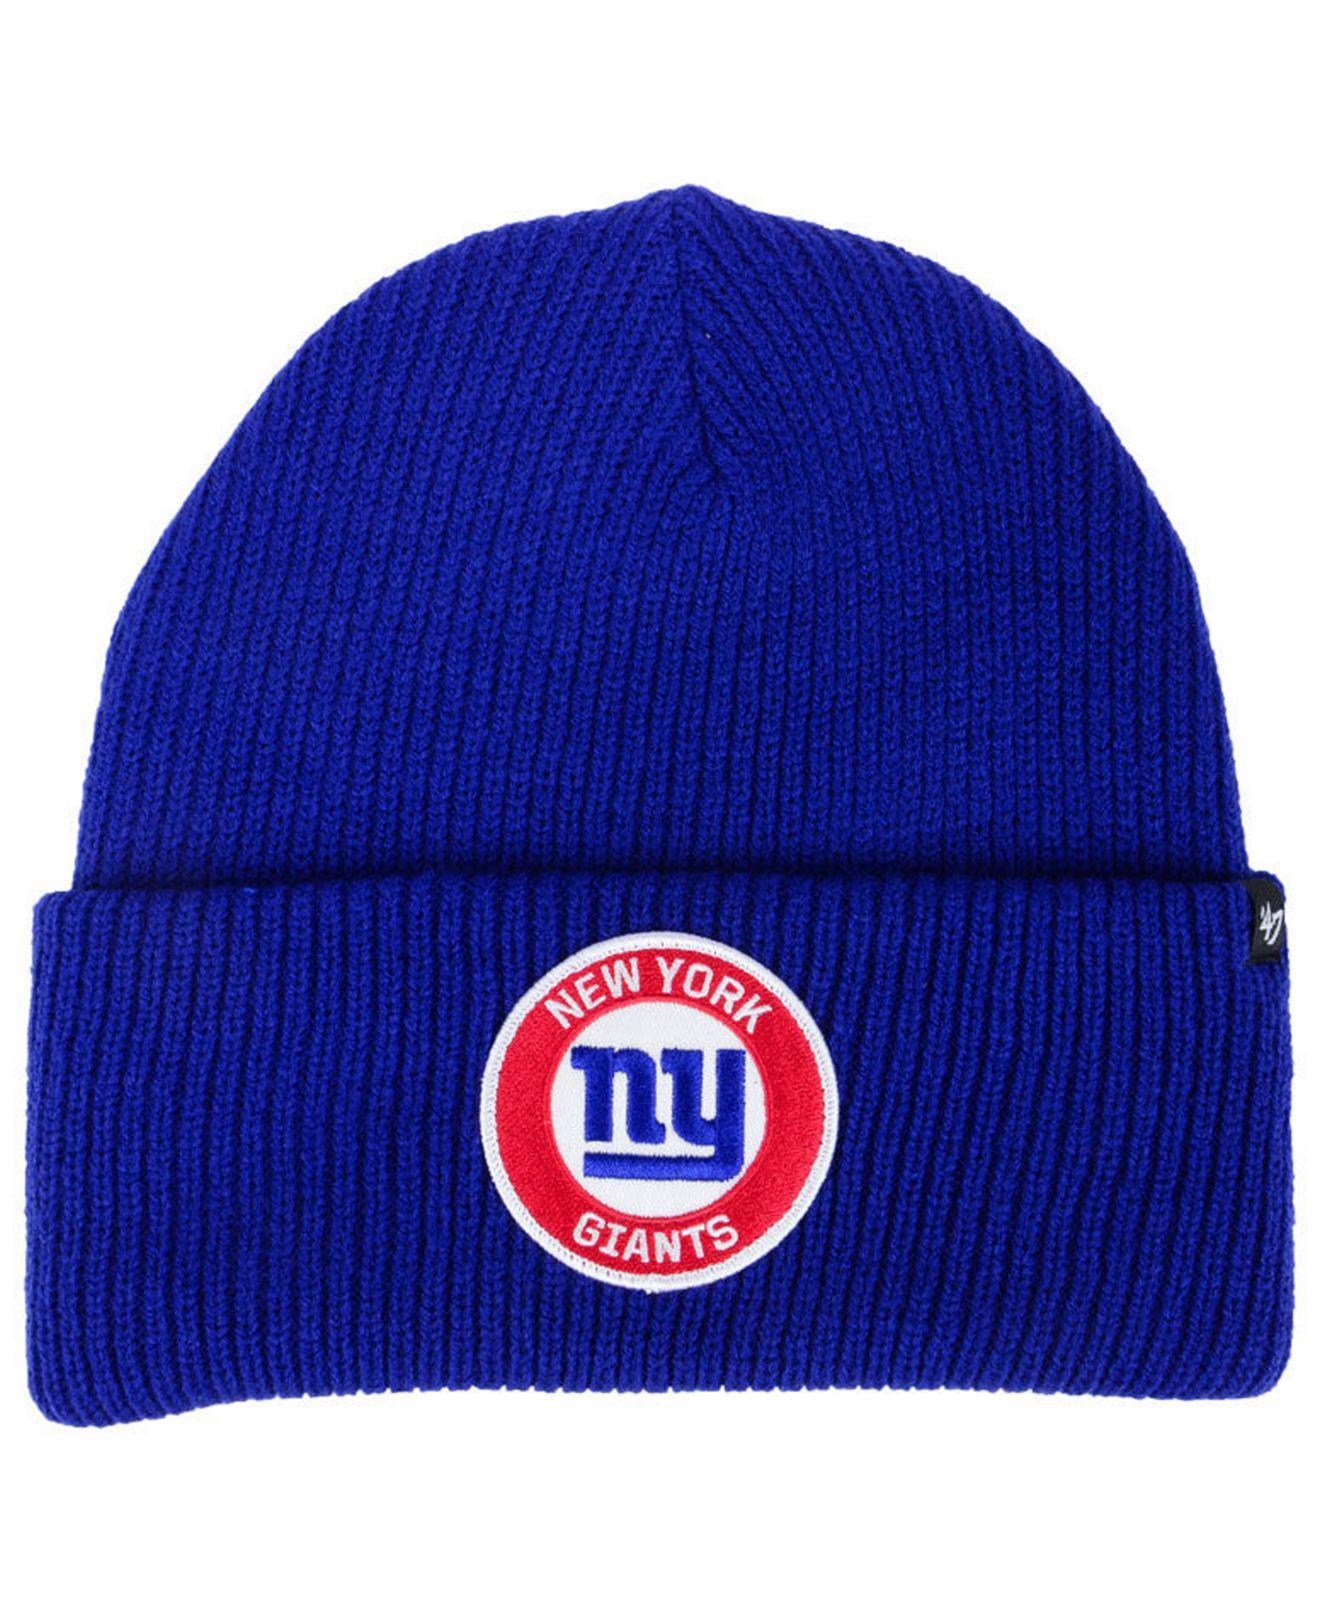 first rate 693c5 89ad1 ... aliexpress 47 brand. mens blue ice block cuff knit hat a78d1 9b182